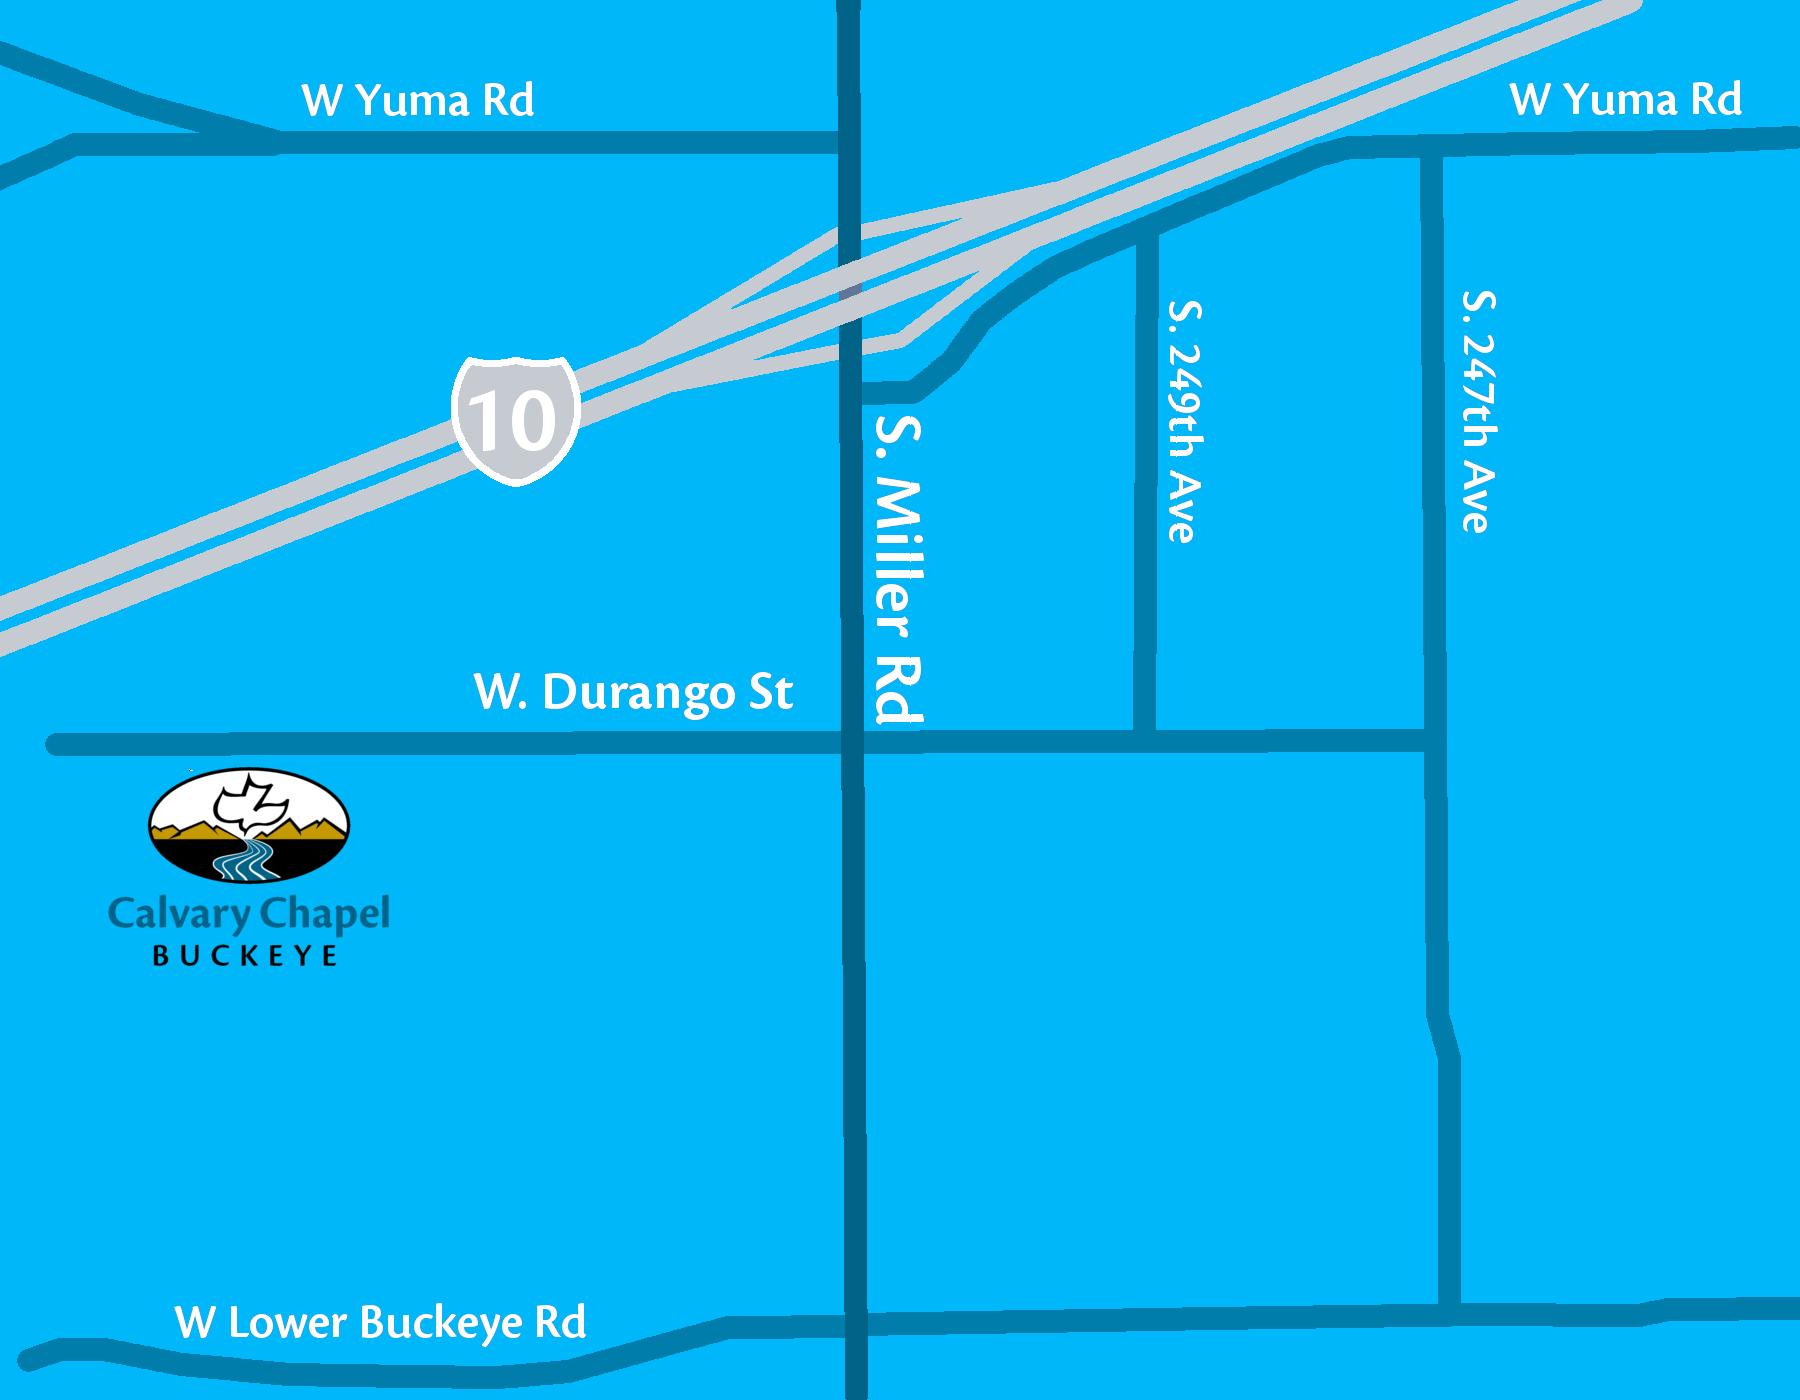 Calvary Chapel Buckeye on philadelphia pennsylvania on us map, arizona weather map, buckeye city, buckeye trail map, verrado community map, bullhead city arizona map, buckeye union high school, buckeye hills regional park, buckeye system map, arizona united states map, san luis arizona map, buckeye wv map, buckeye mini storage, bar x ranch map, buckeye arizona, buckeye valley high school map,